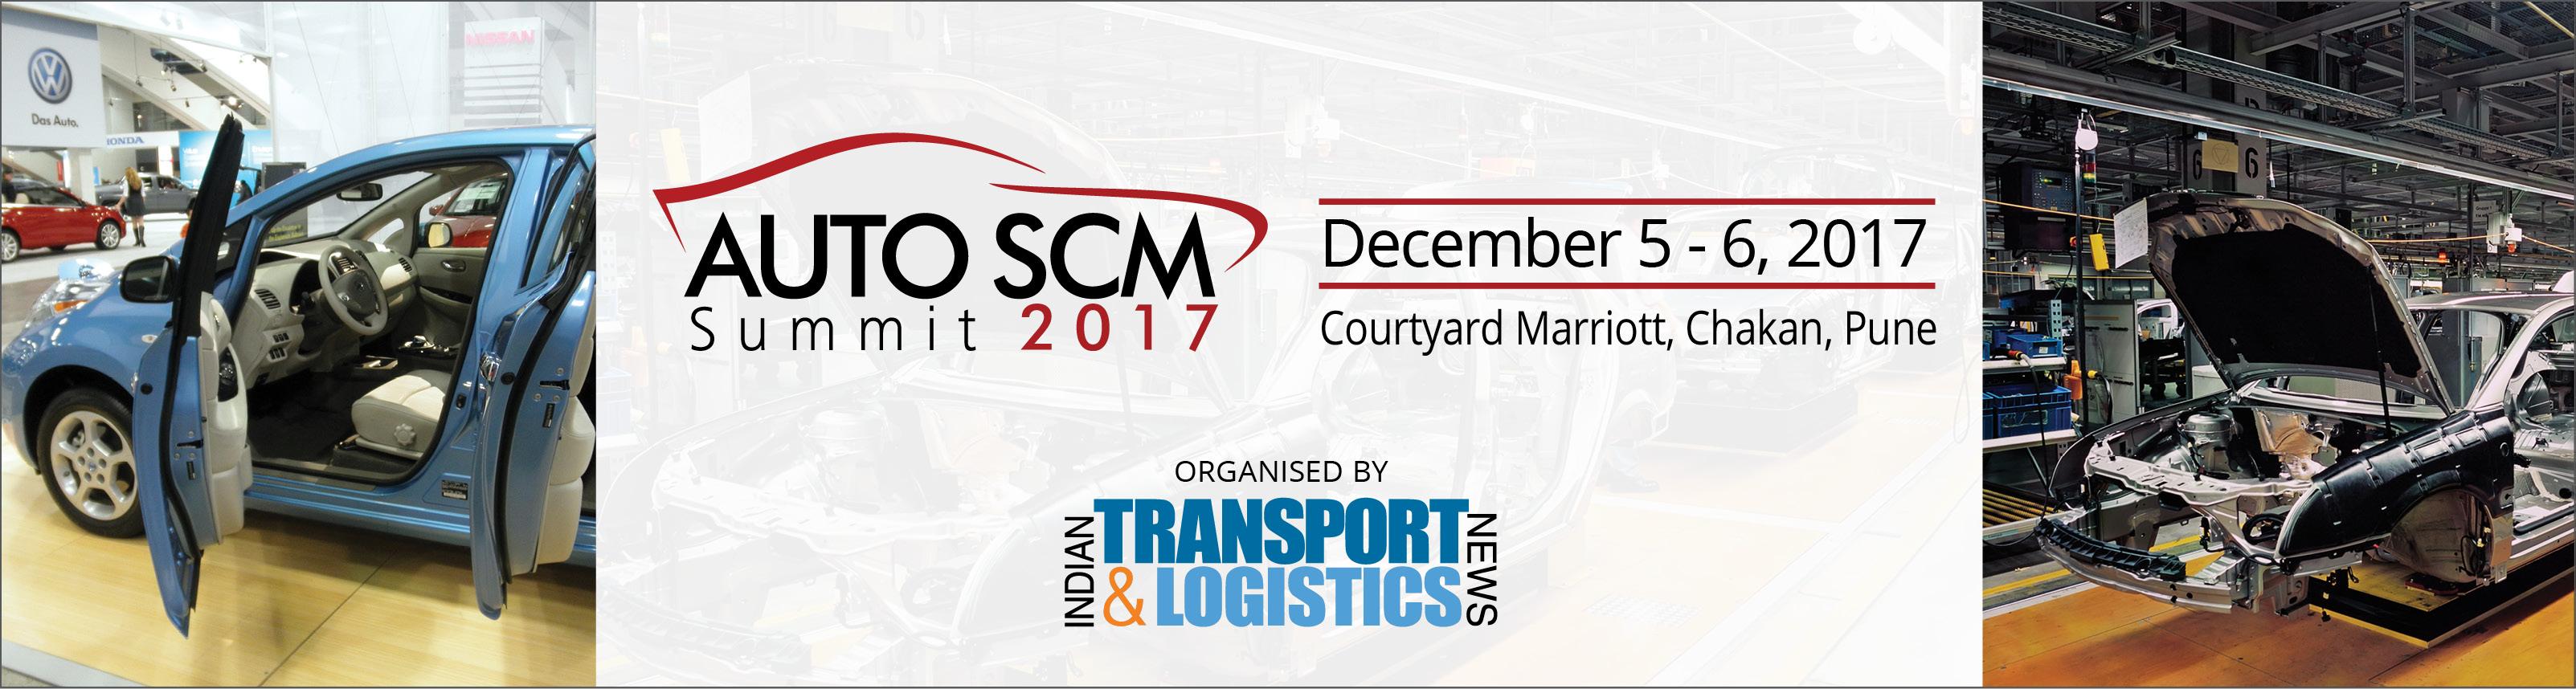 Auto SCM Summit 2017